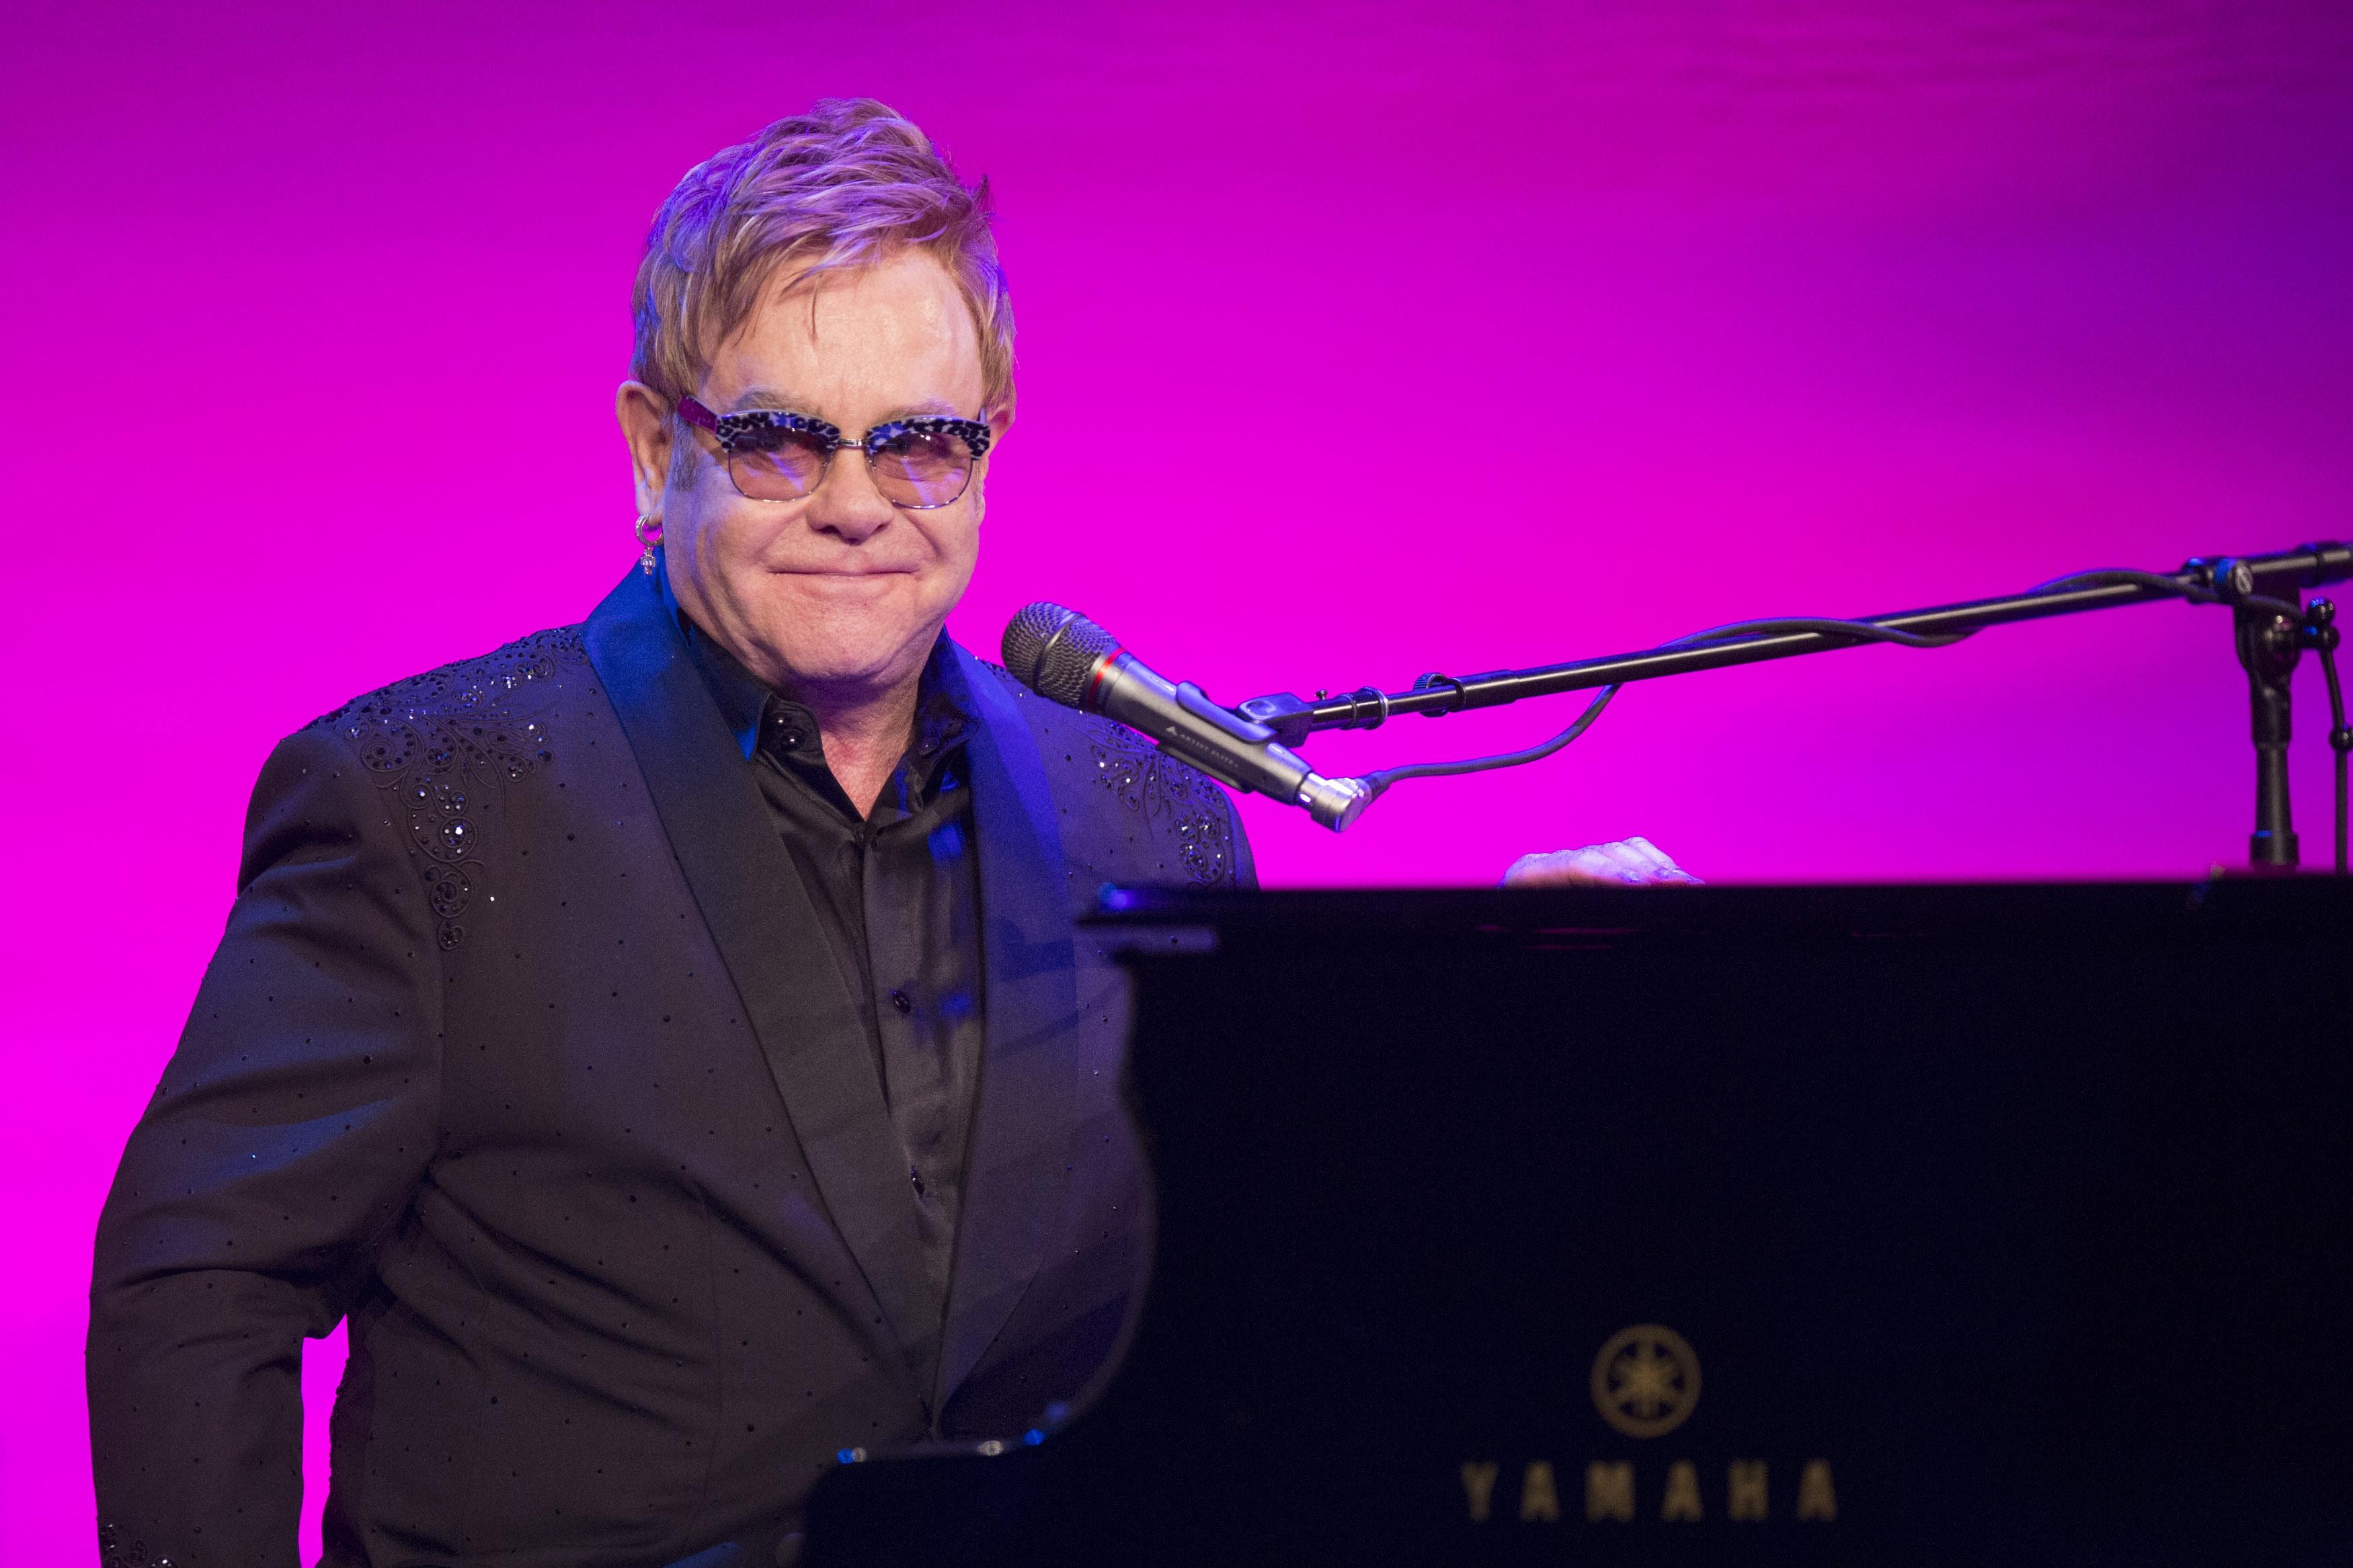 Elton John Computer Backgrounds